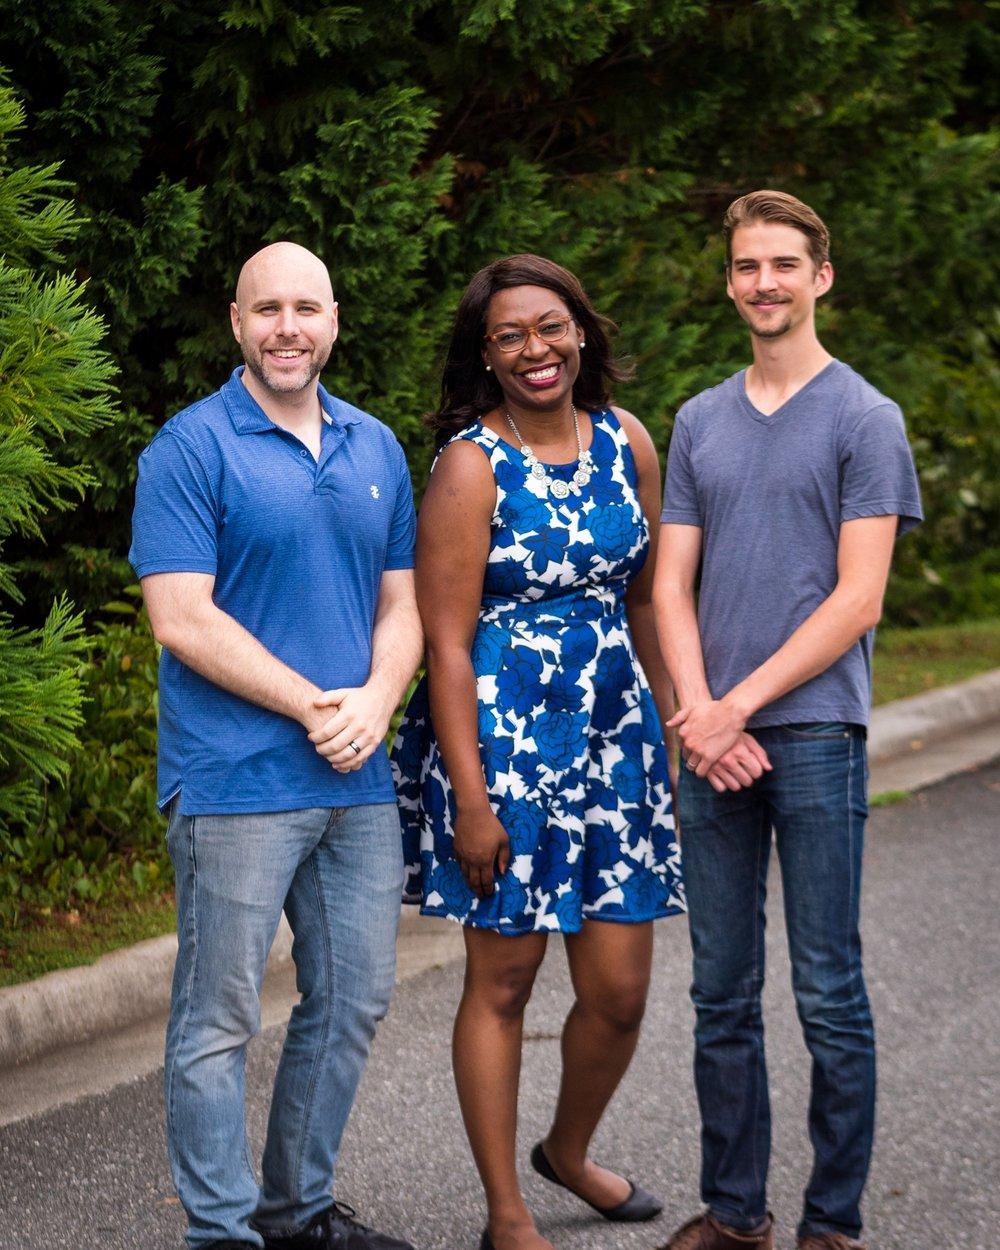 From Left to Right: Joshua Delivuk, LaShonda Delivuk & Thomas Fisher